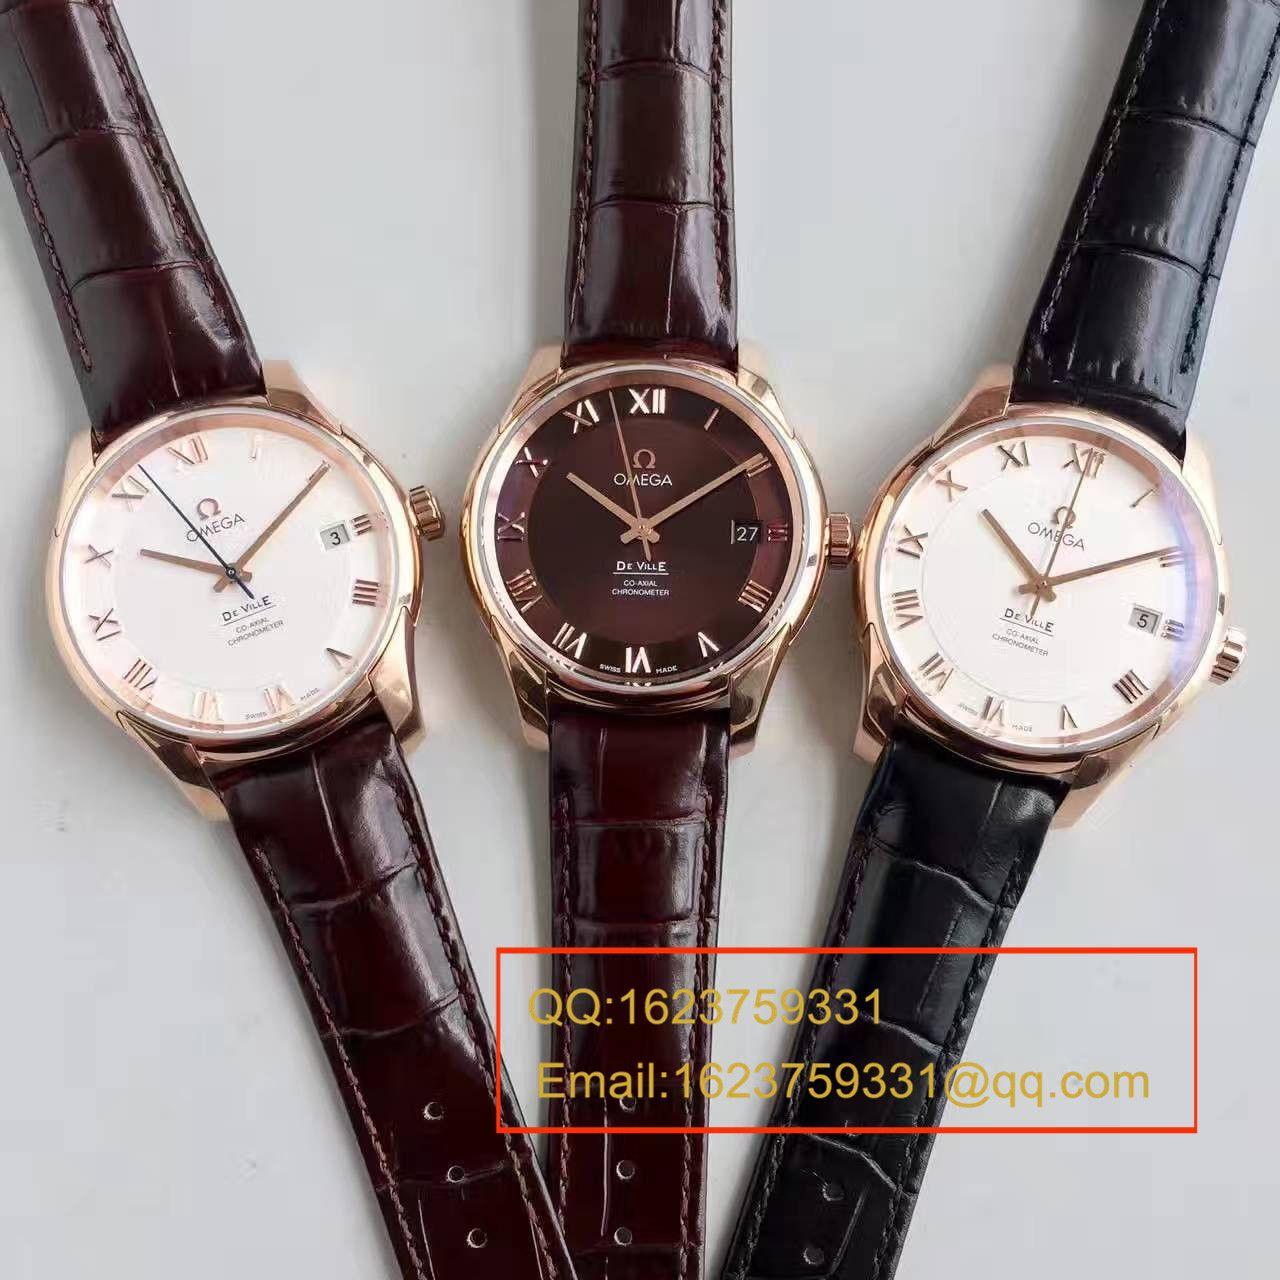 【SSS厂顶级1:1复刻手表】欧米茄碟飞系列431.10.41.21.02.001腕表 / M204A